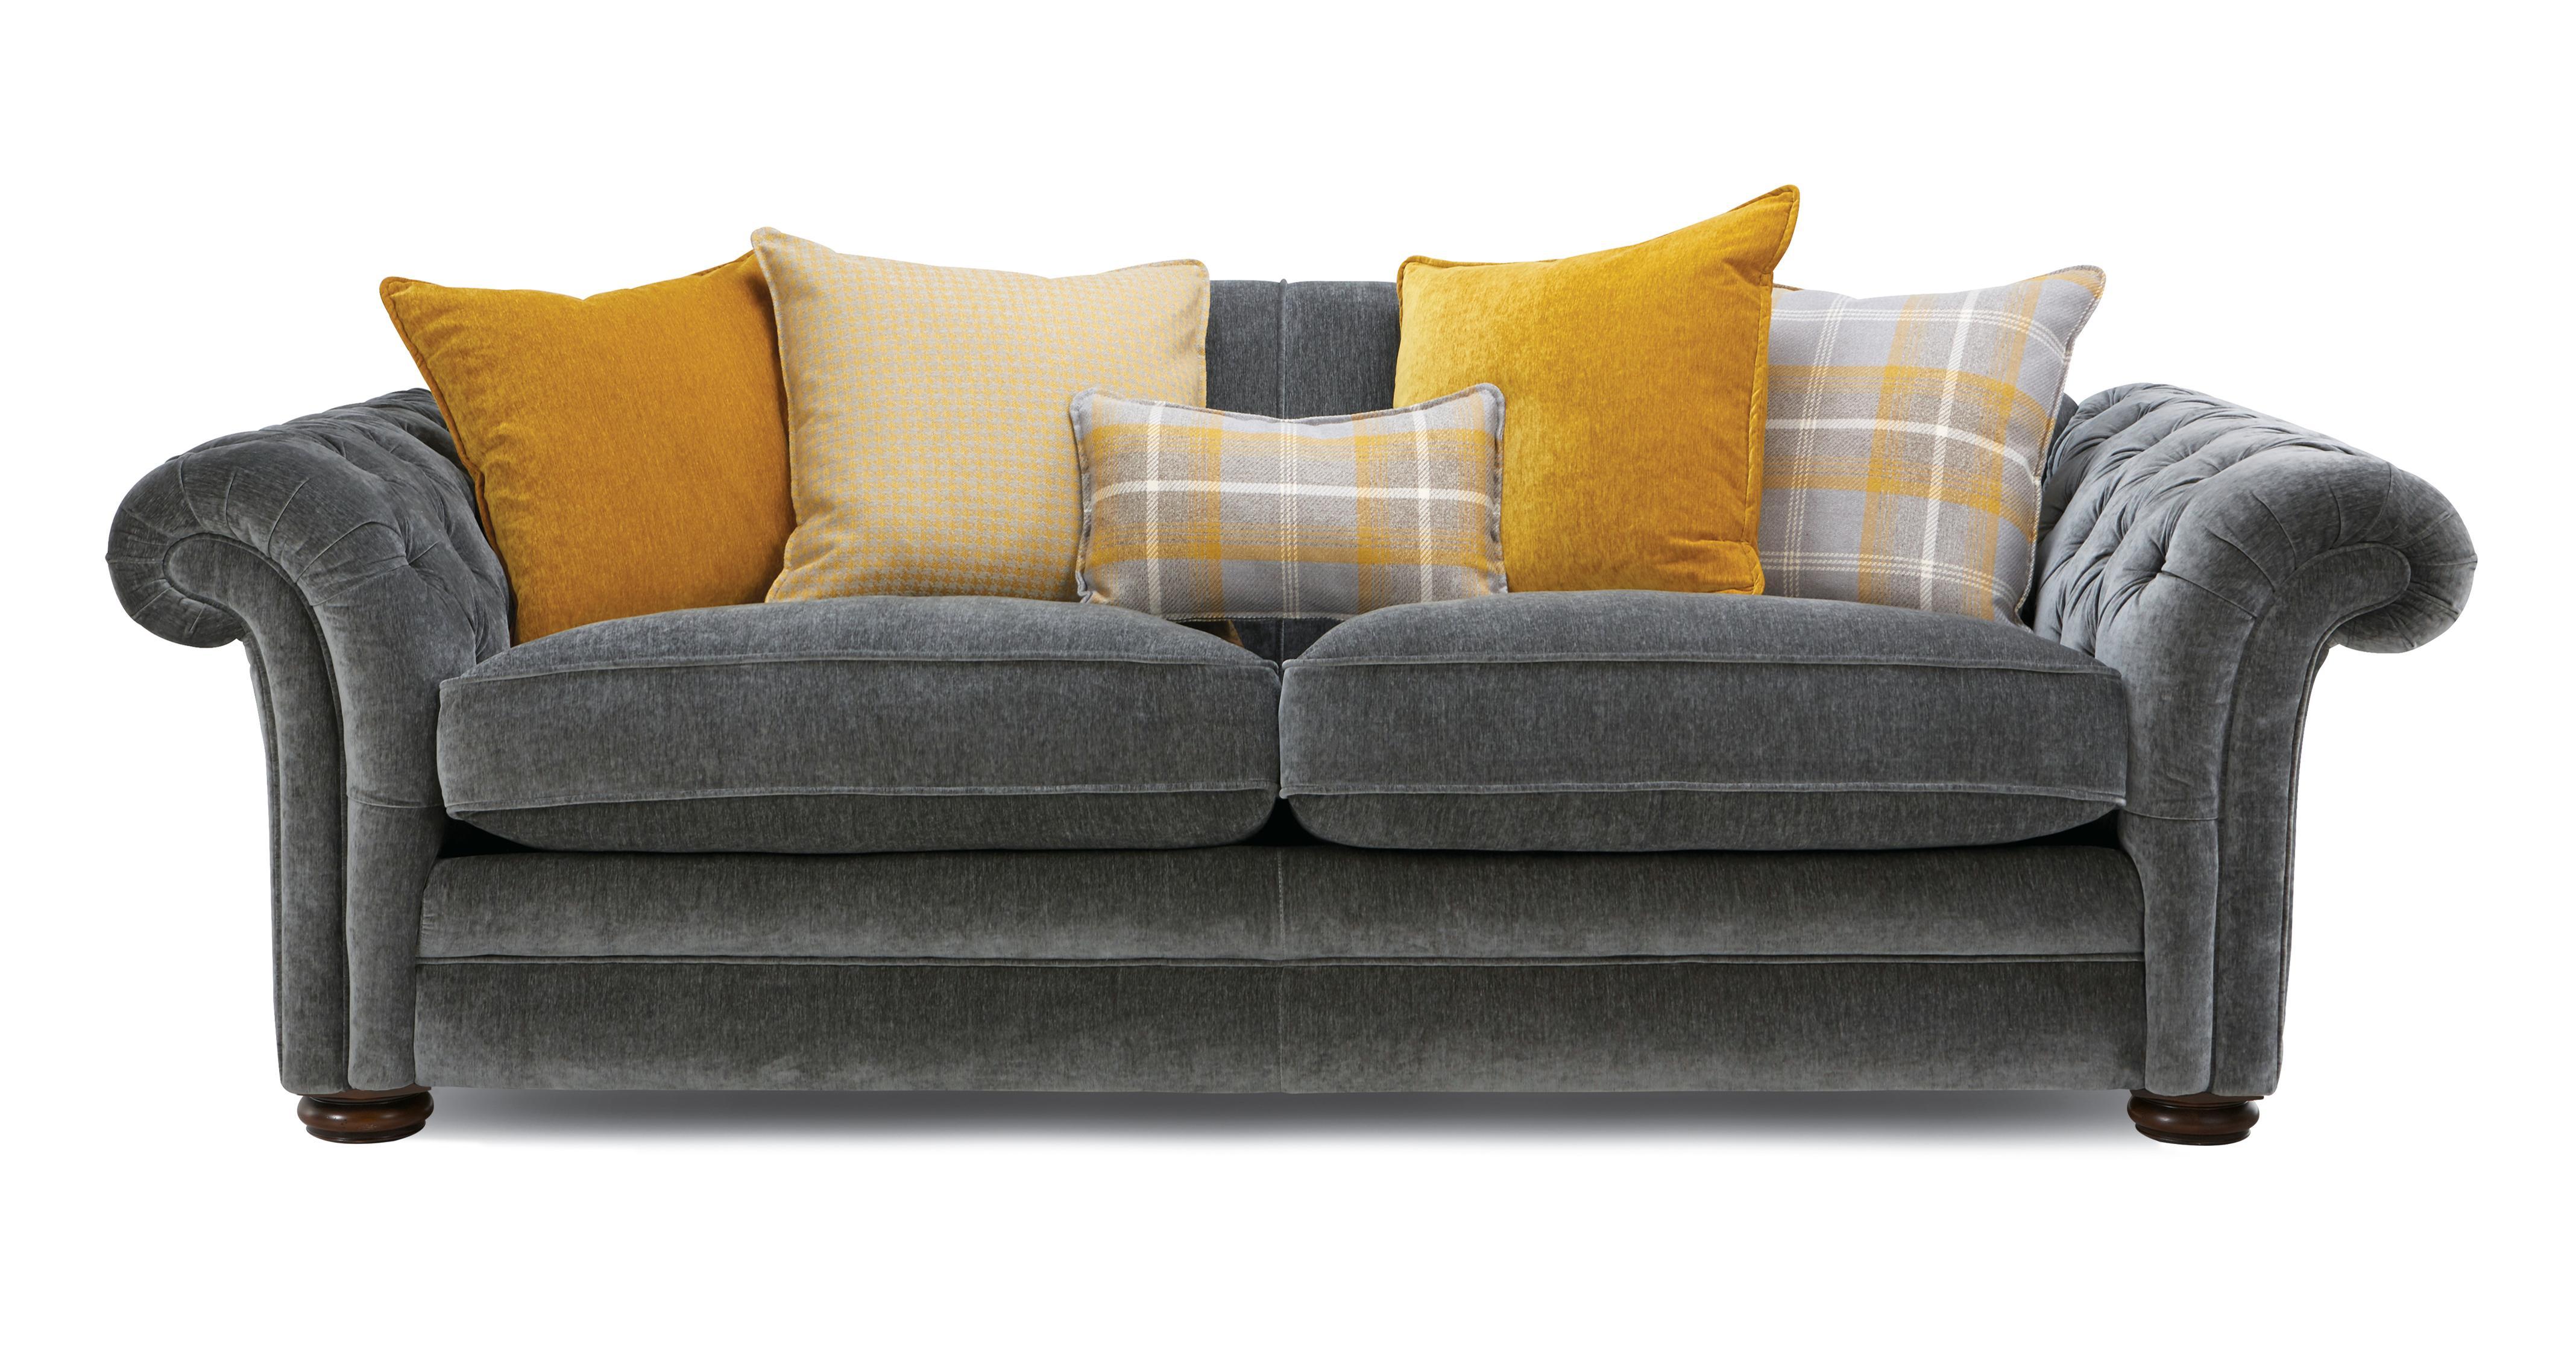 Prime Warwick Pillow Back 2 Seater Sofa Uwap Interior Chair Design Uwaporg